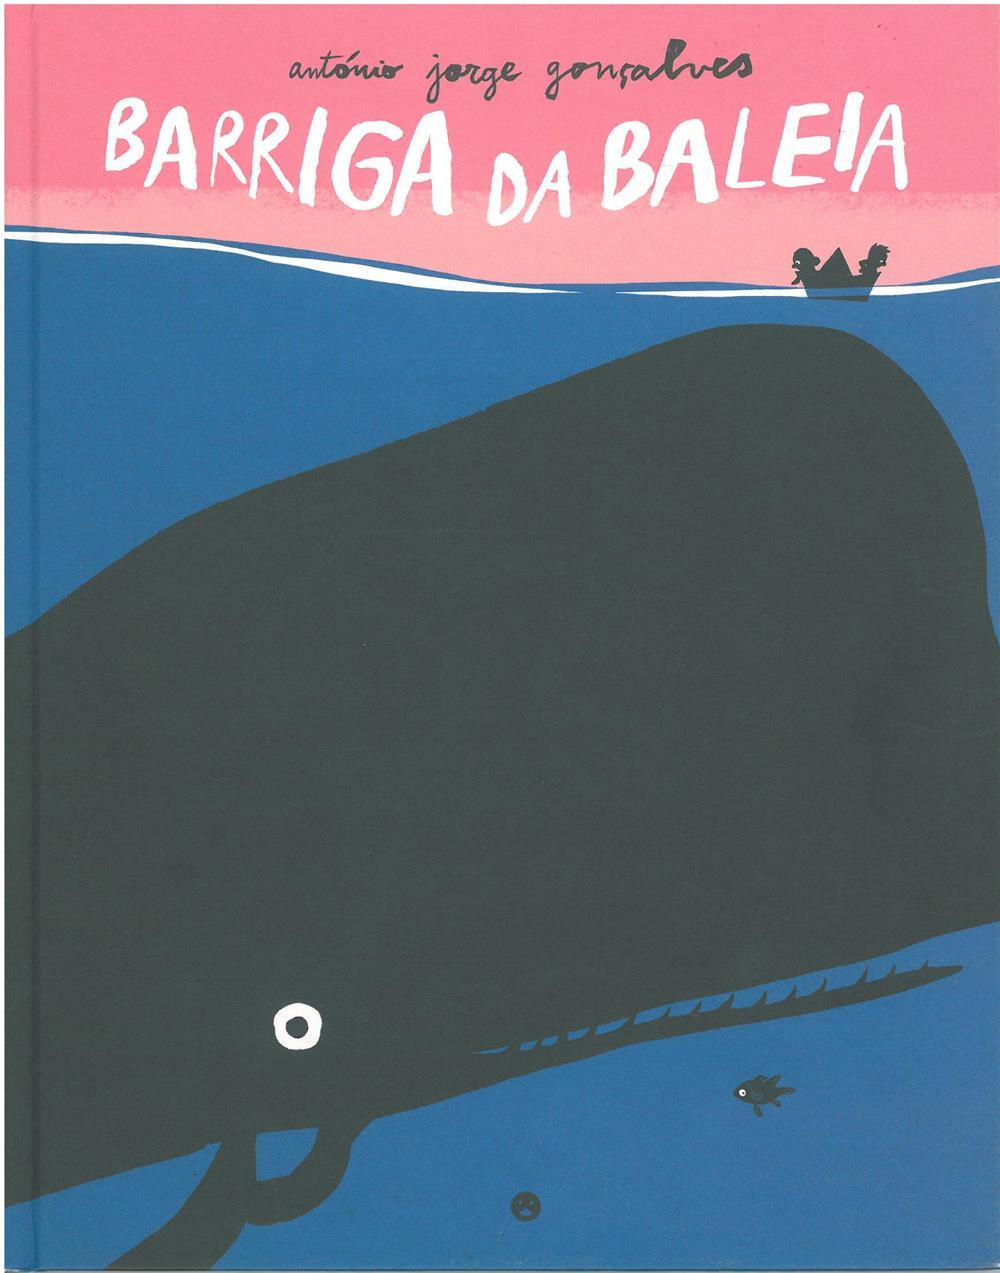 Barriga da baleia_.jpg